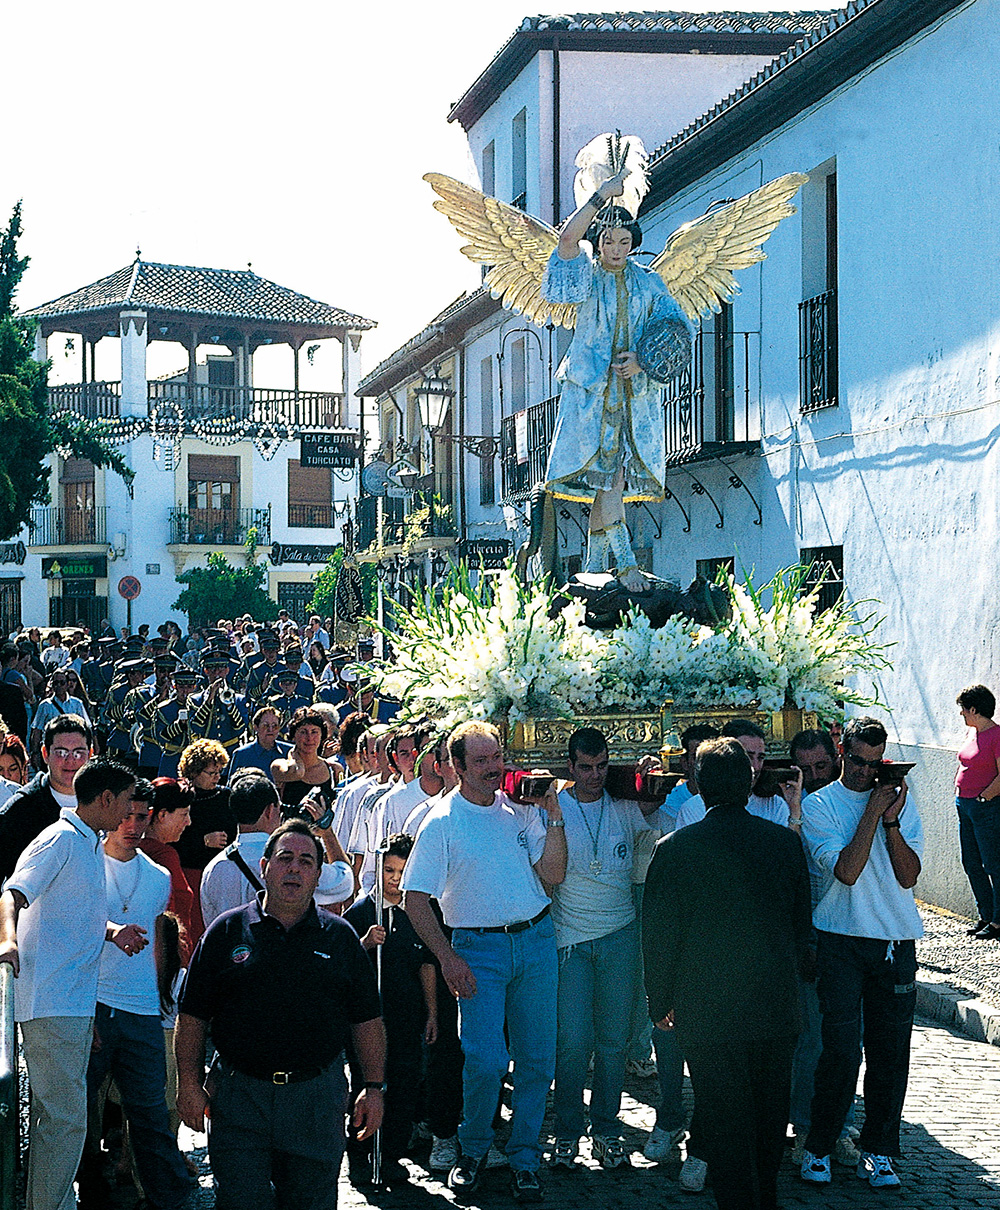 Pilgrimage of Saint Michael, in the Albaycín district in Granada.